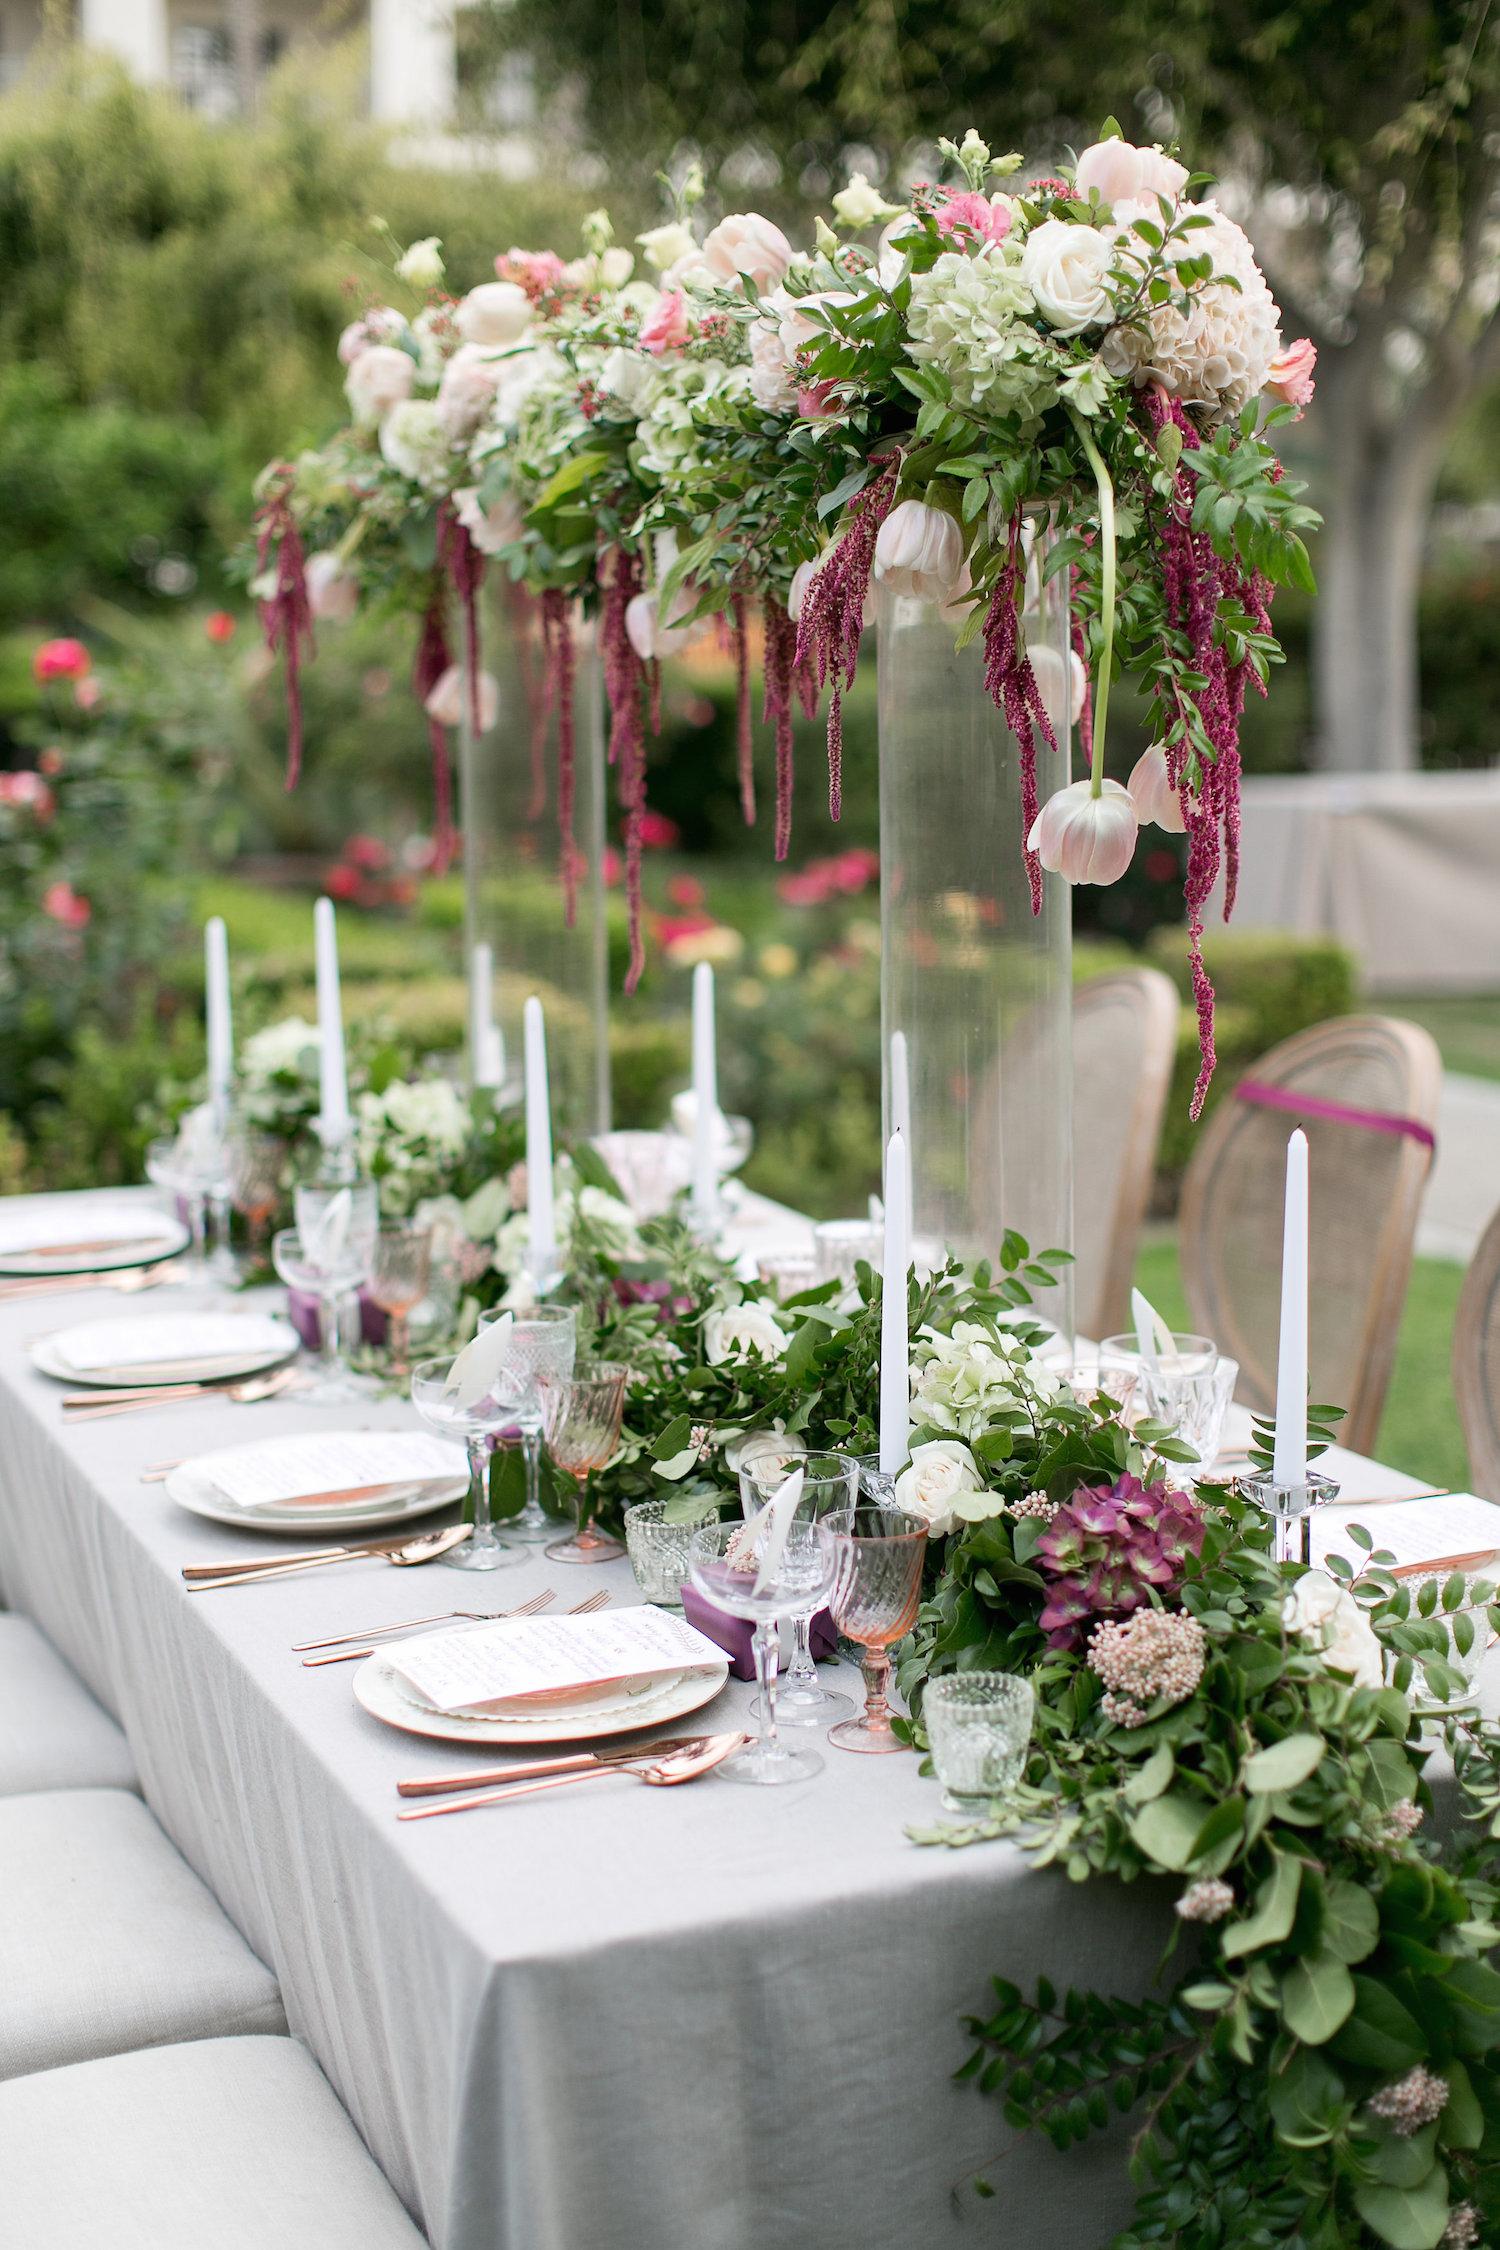 Park Hyatt Aviara wedding by San Diego wedding florist, Compass Floral.